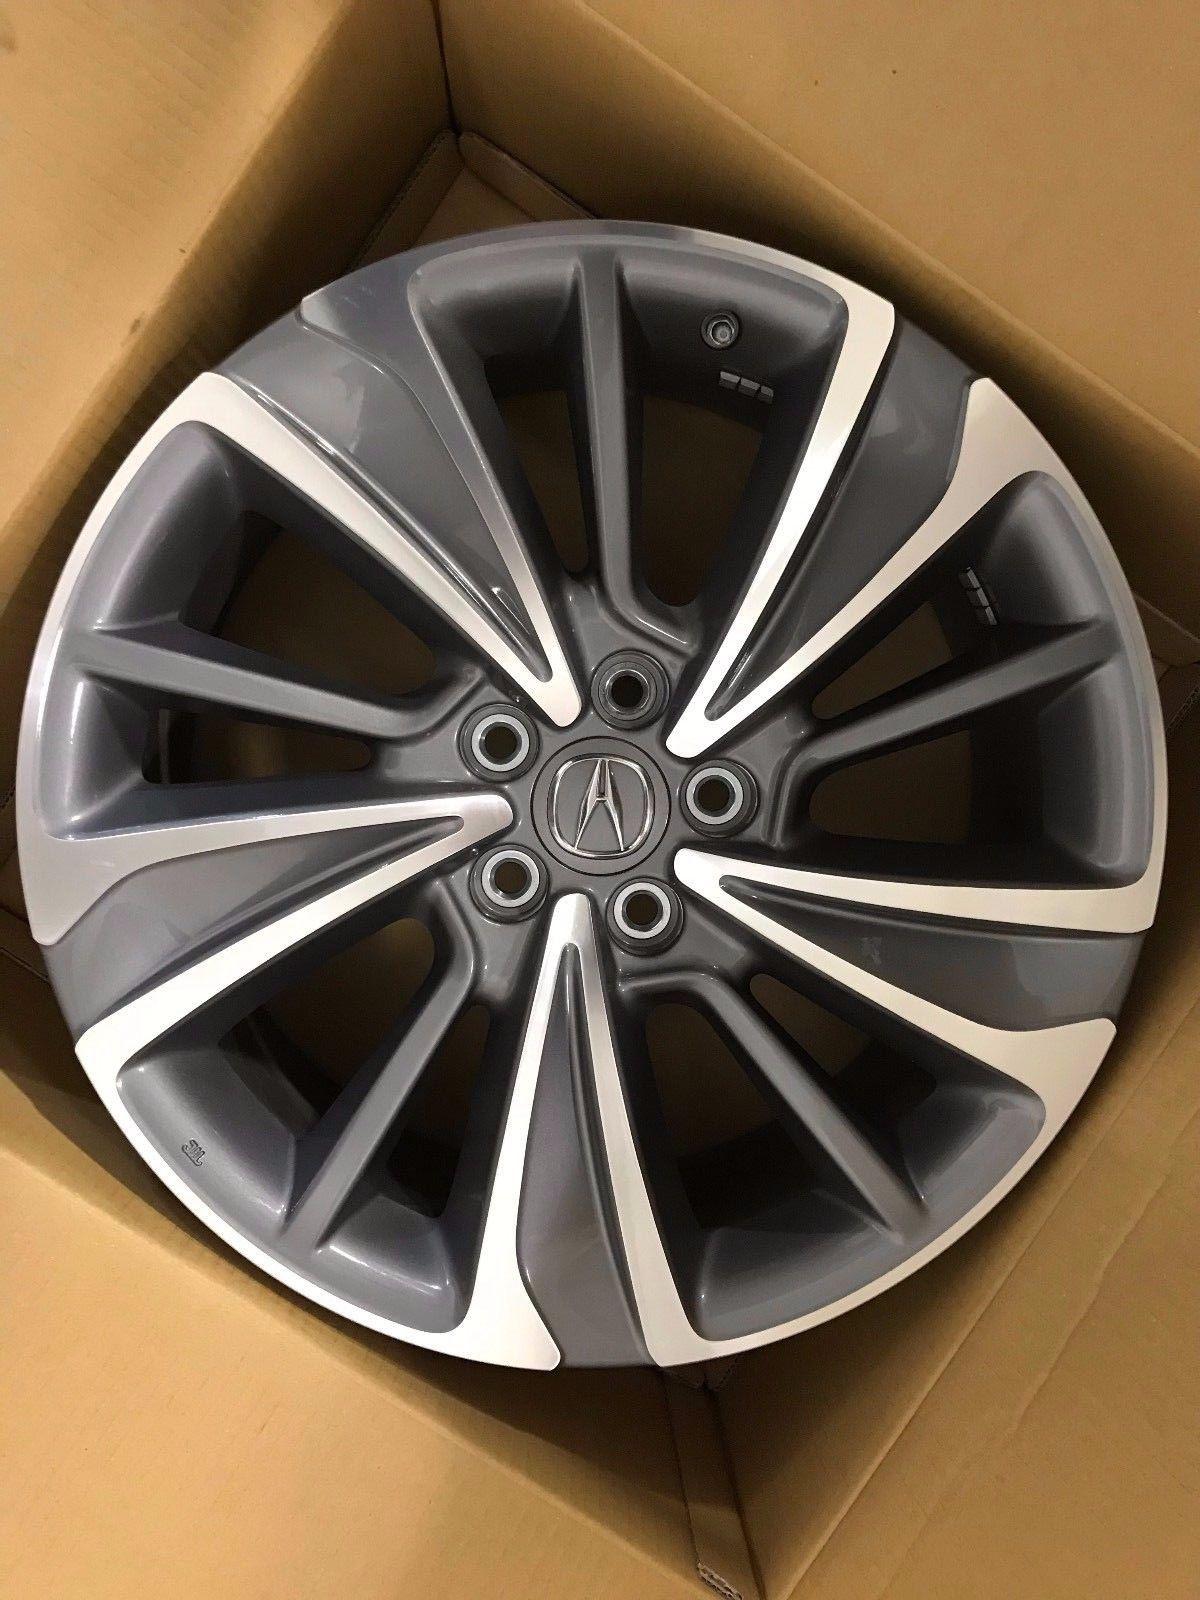 New 2018 Mdx Tech Wheels Acura Mdx Forum Acura Mdx Suv